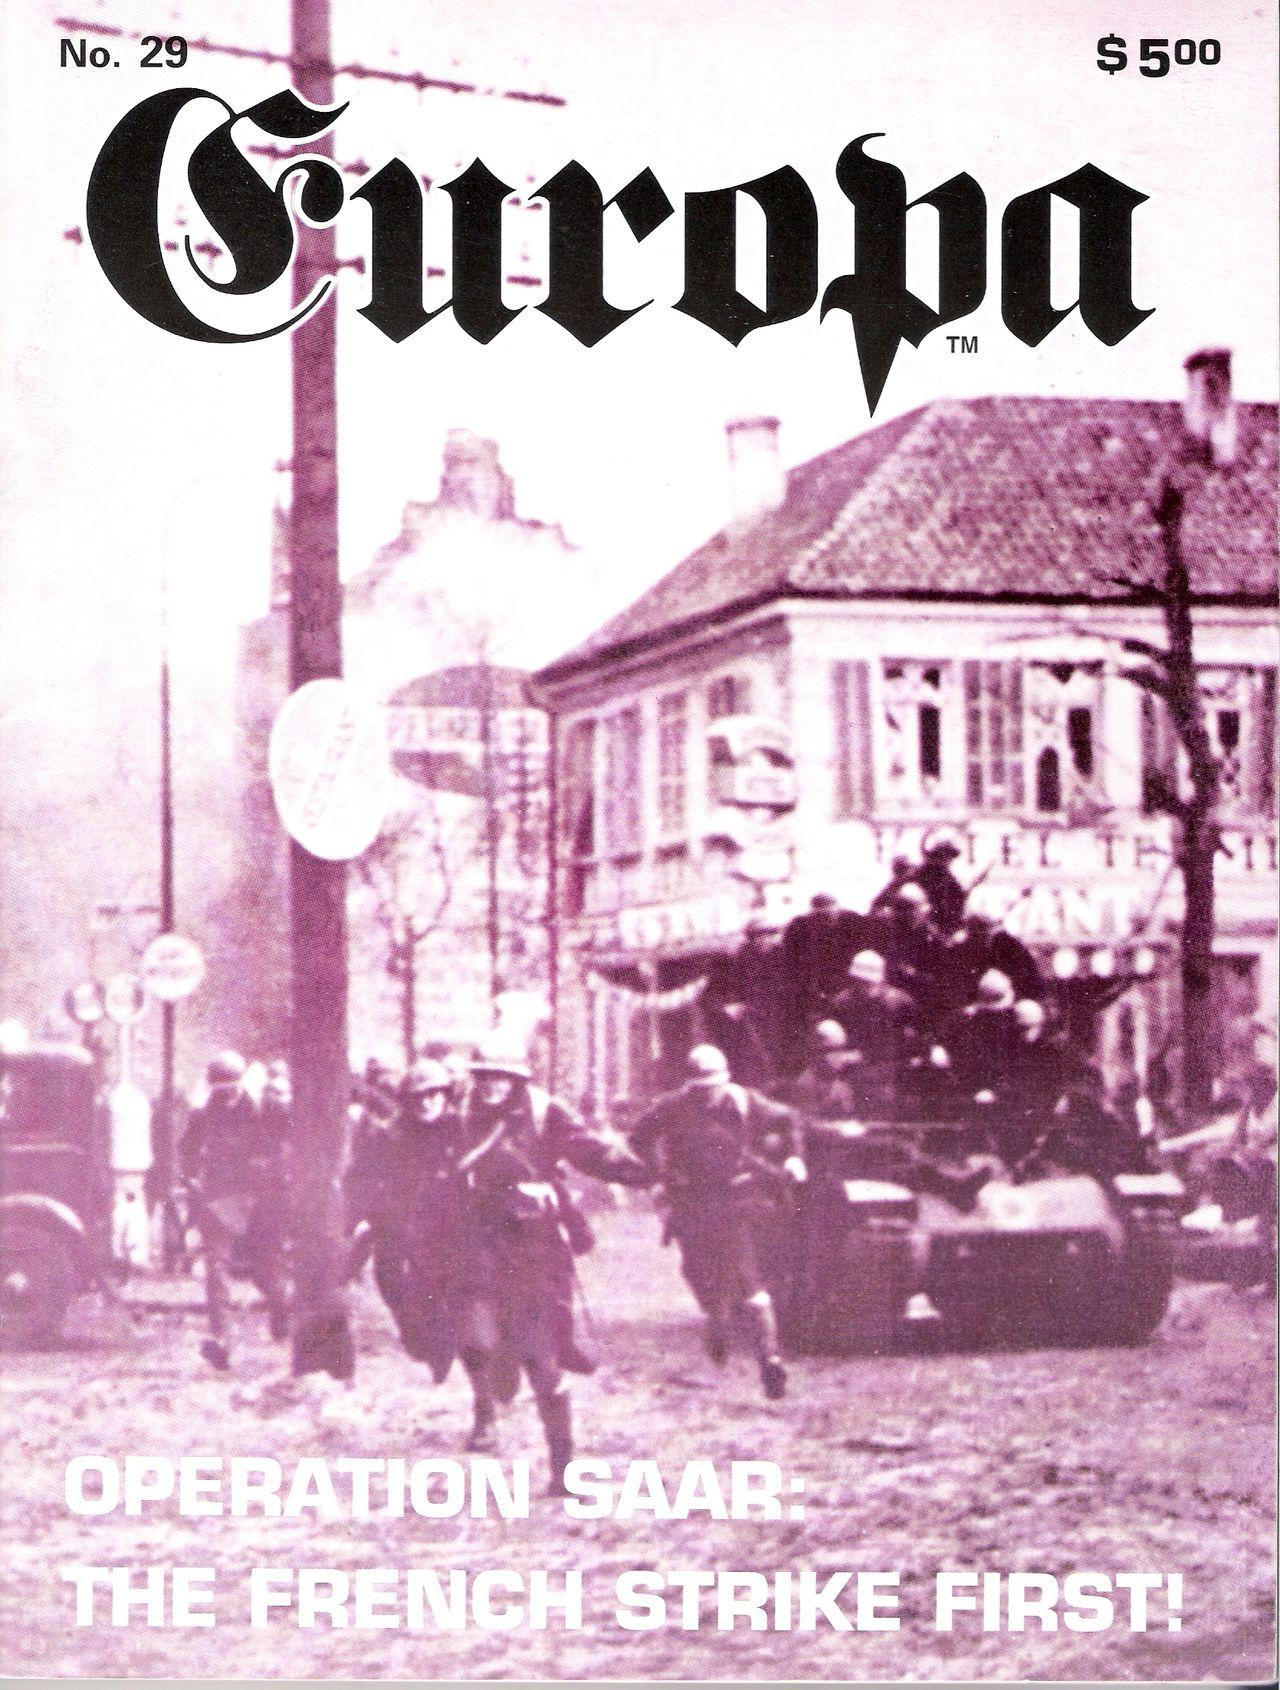 The Europa Magazine #29 - Cover